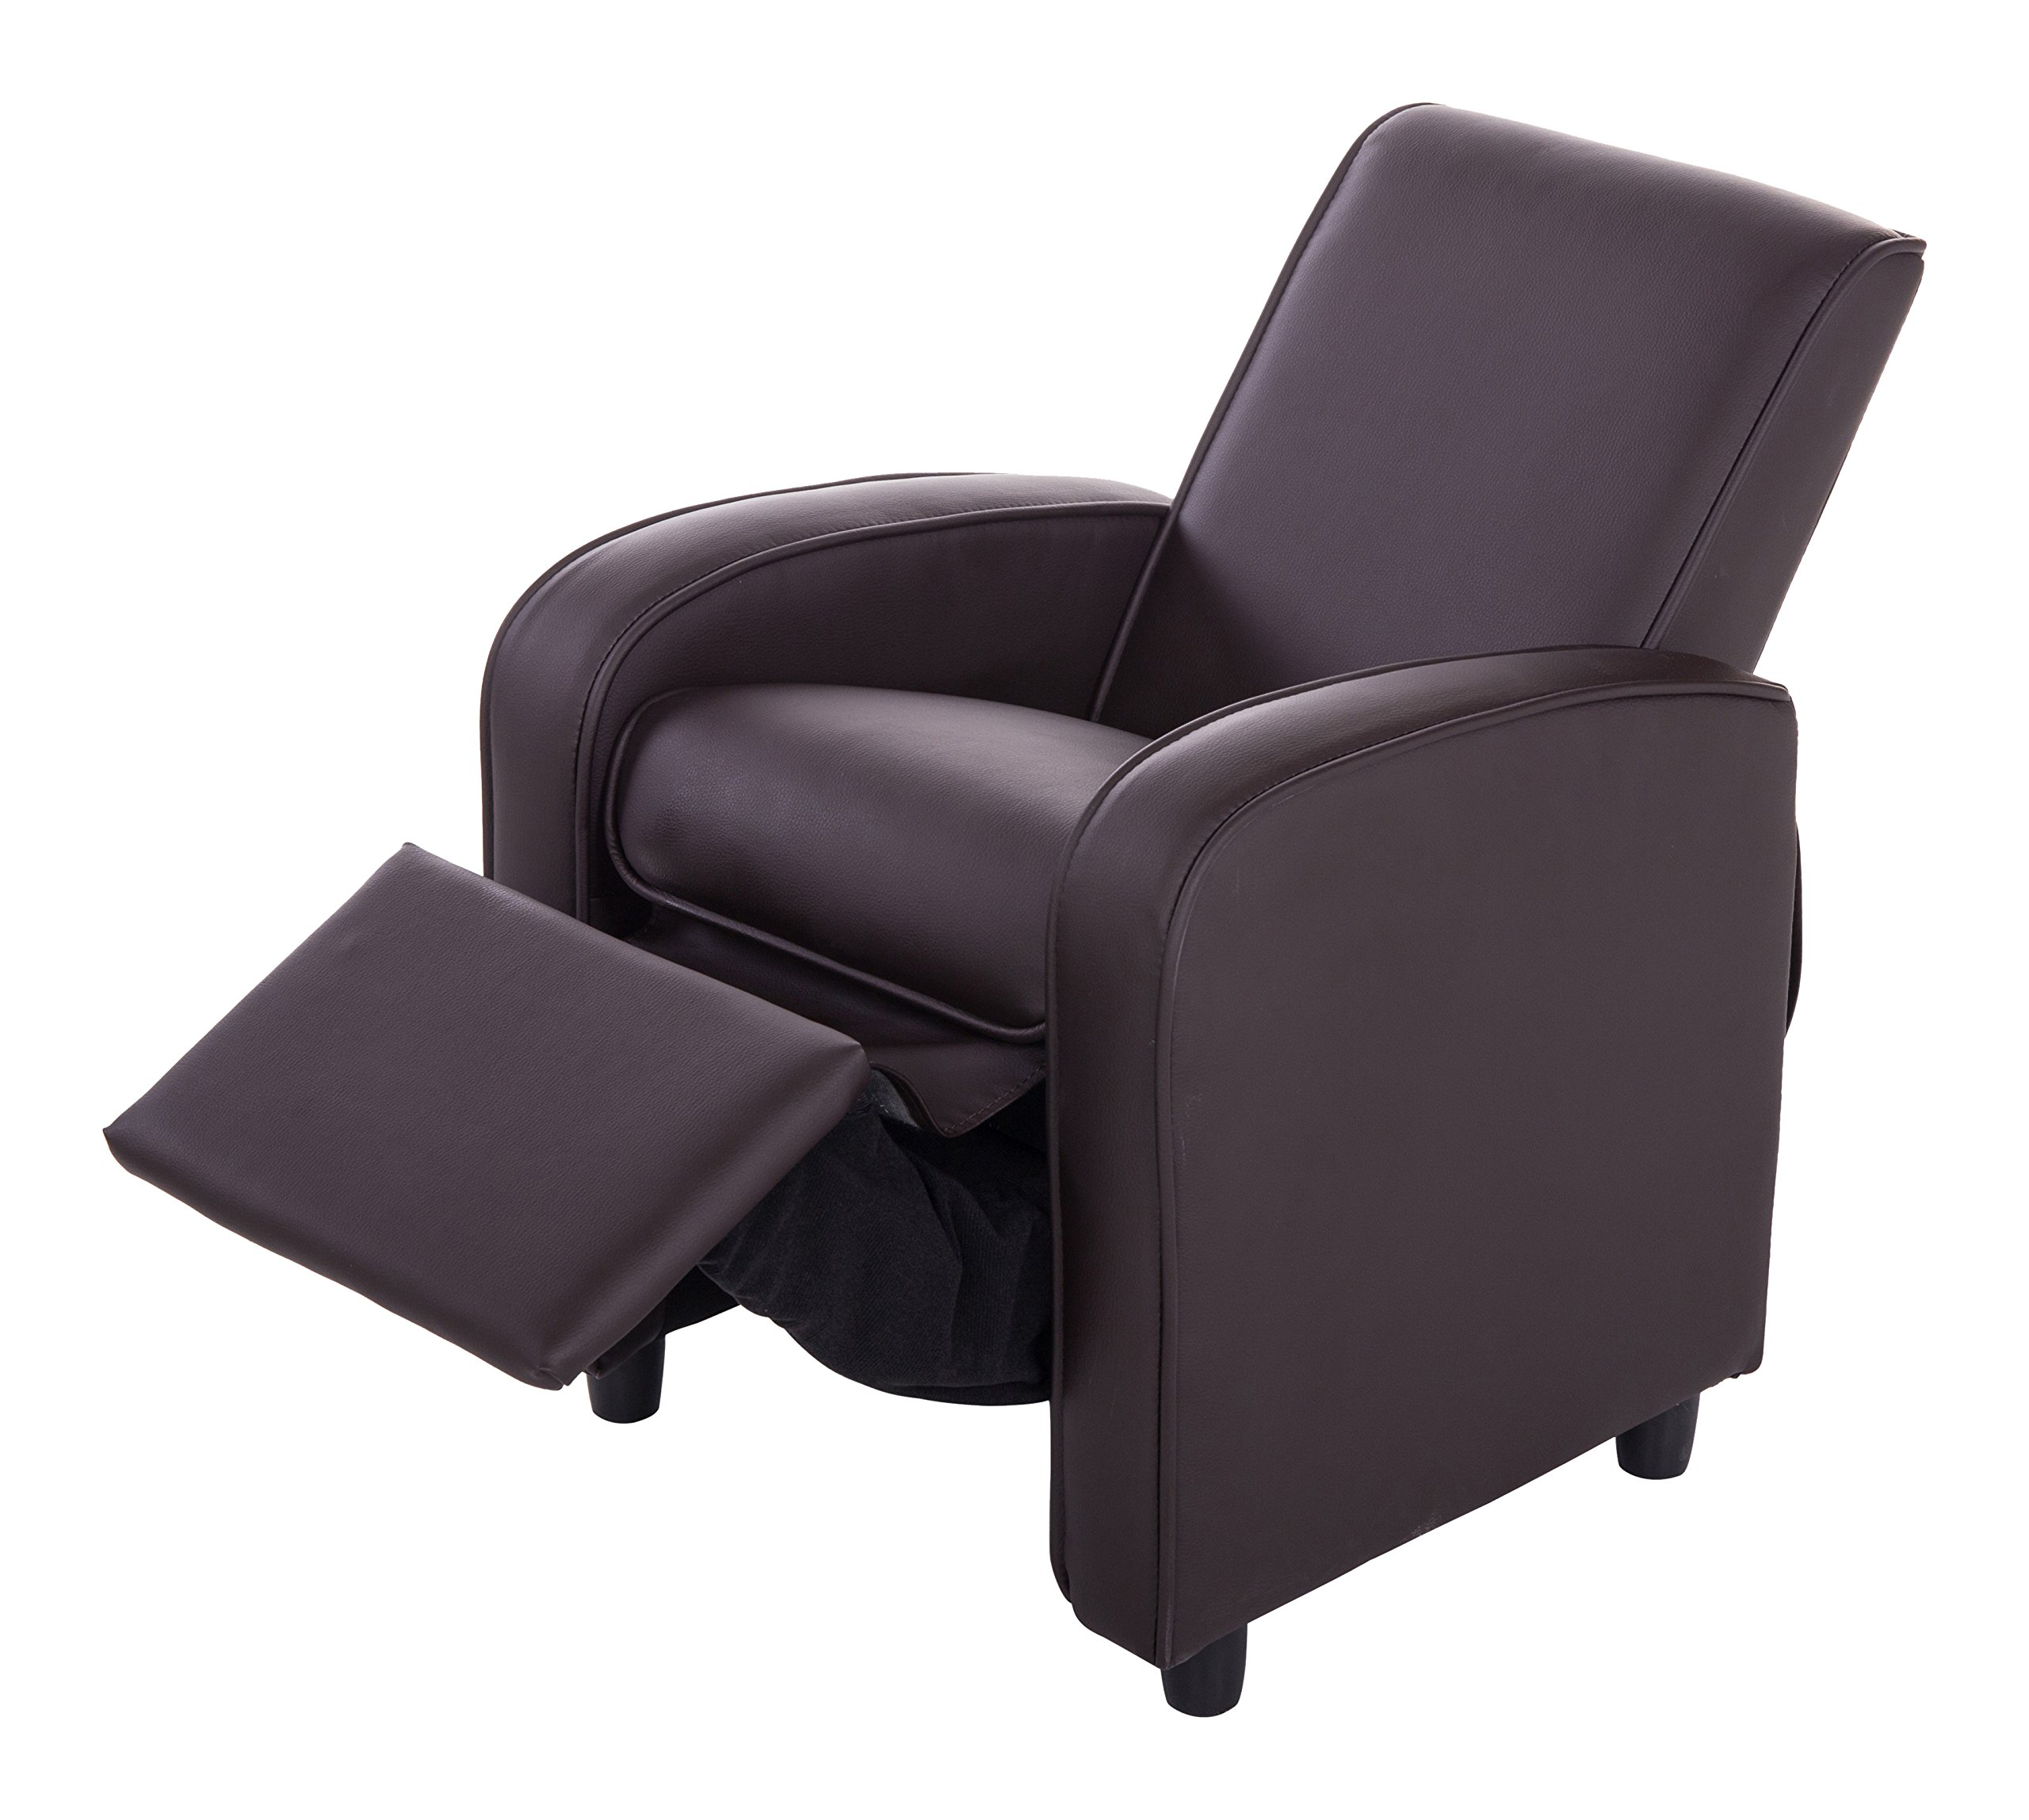 Mochi Furniture KR2021BRN PU Leather Kids Recliner, Brown by Mochi Furniture